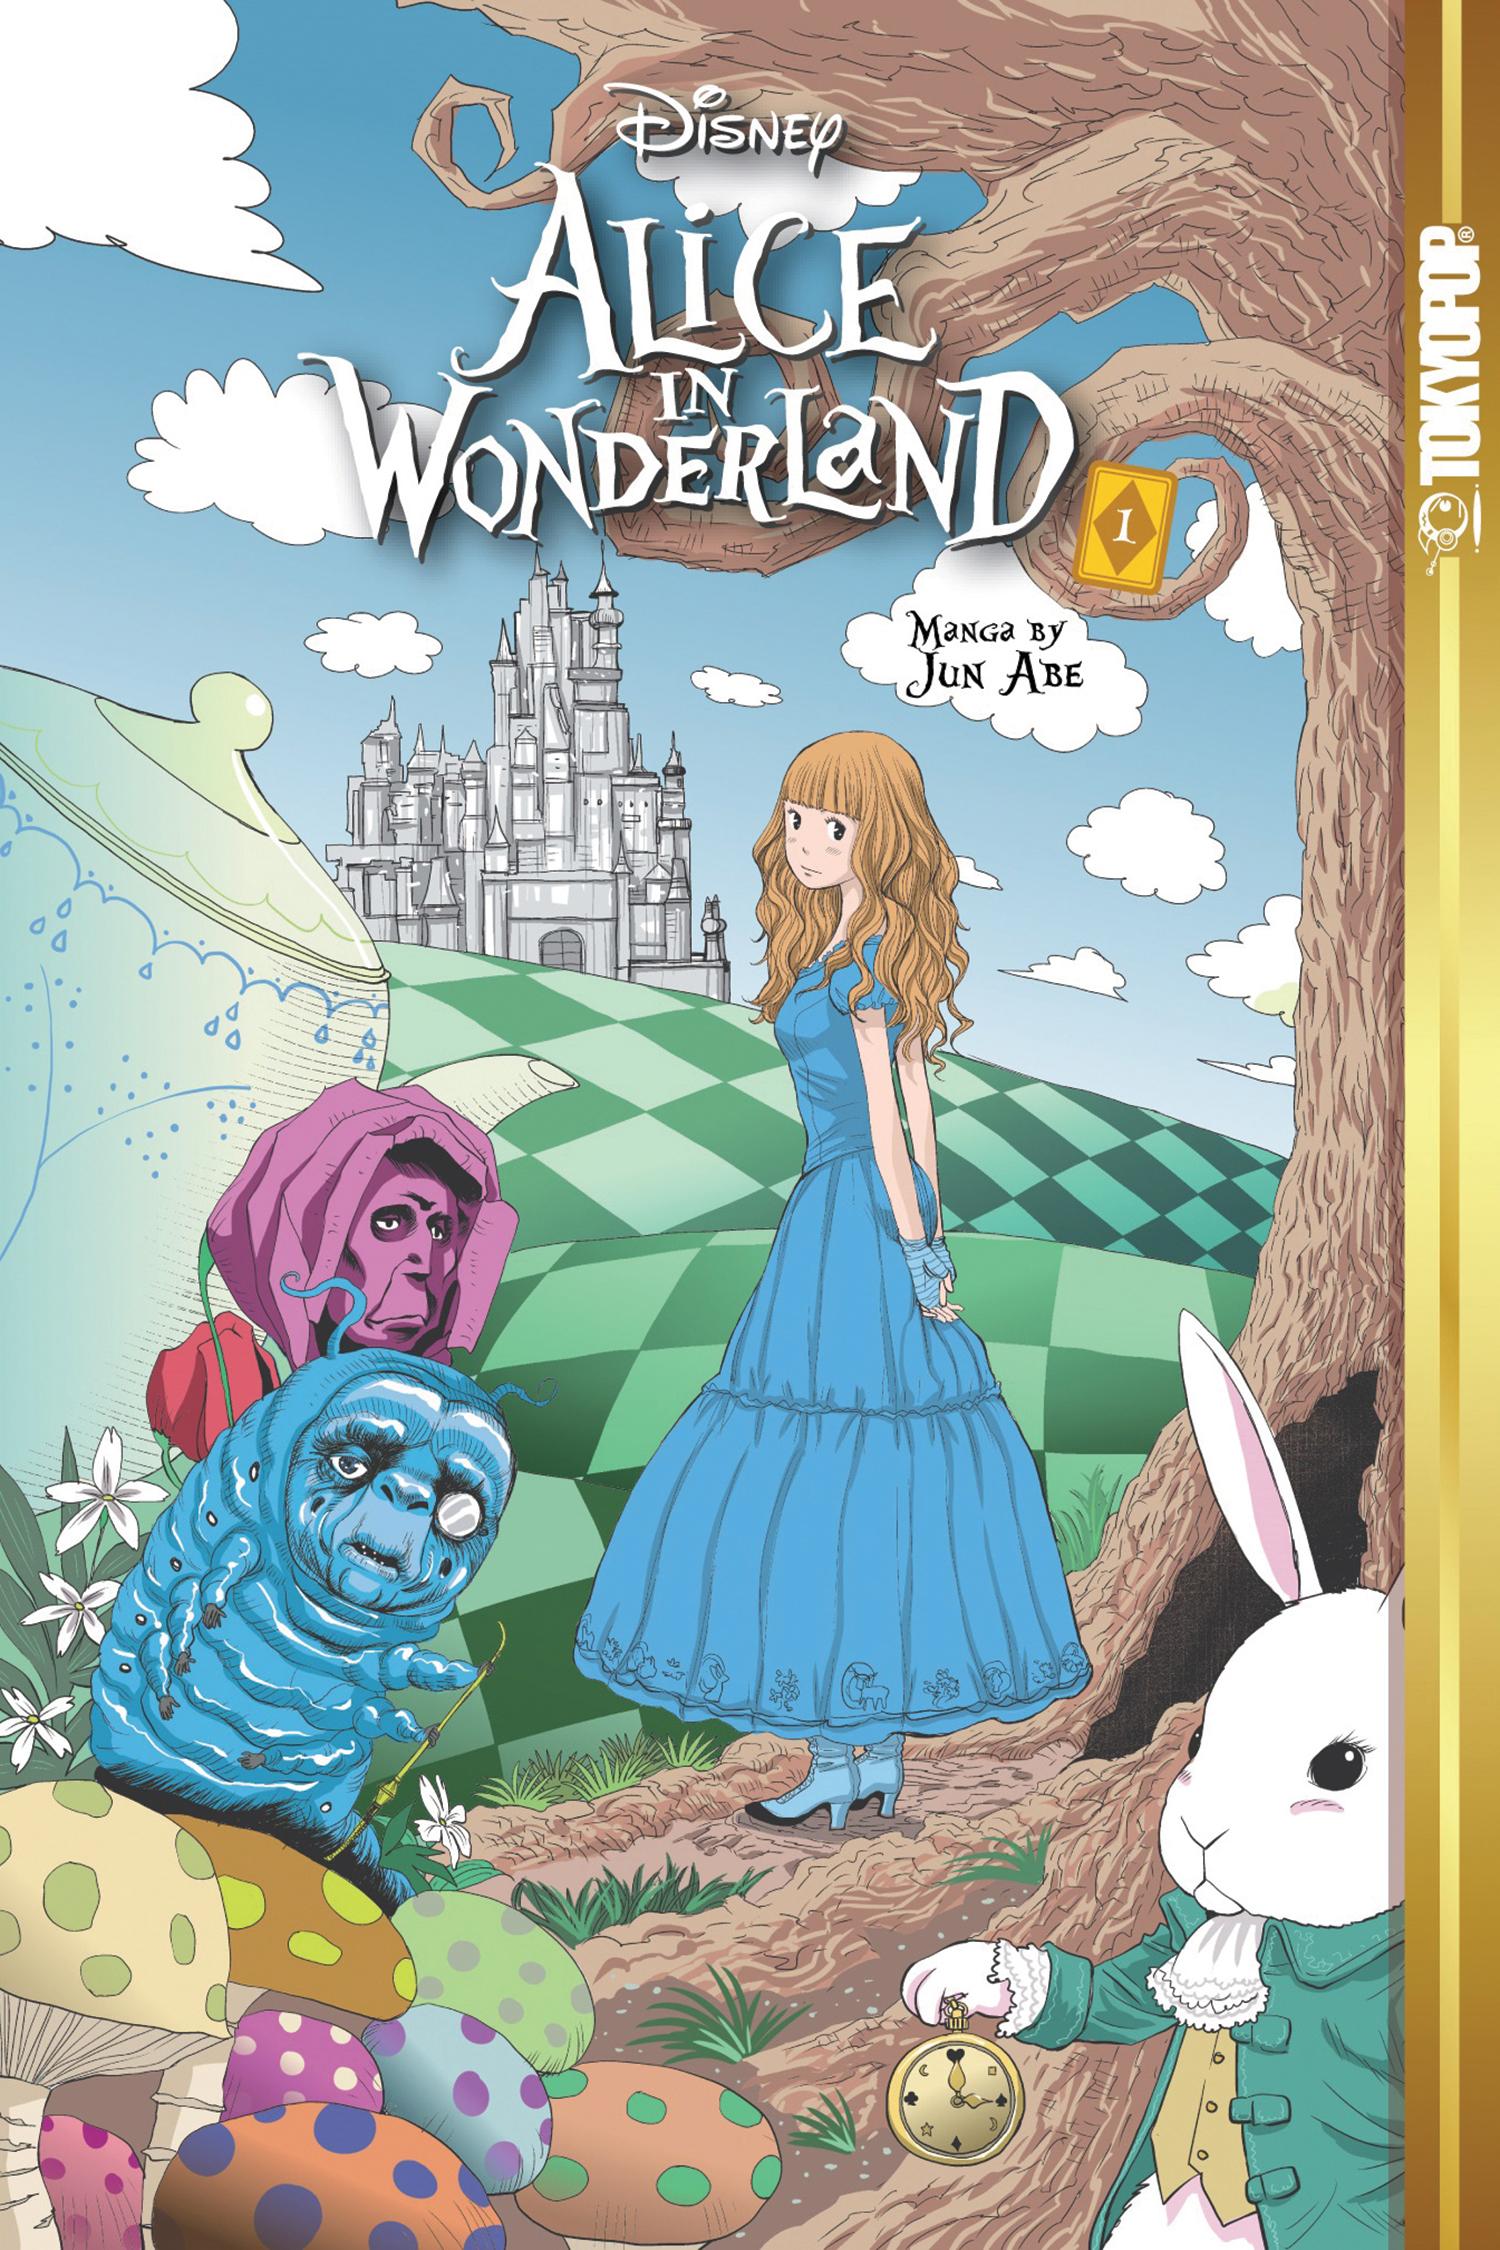 Disney Alice in Wonderland, Vol. 1 (ebook version)